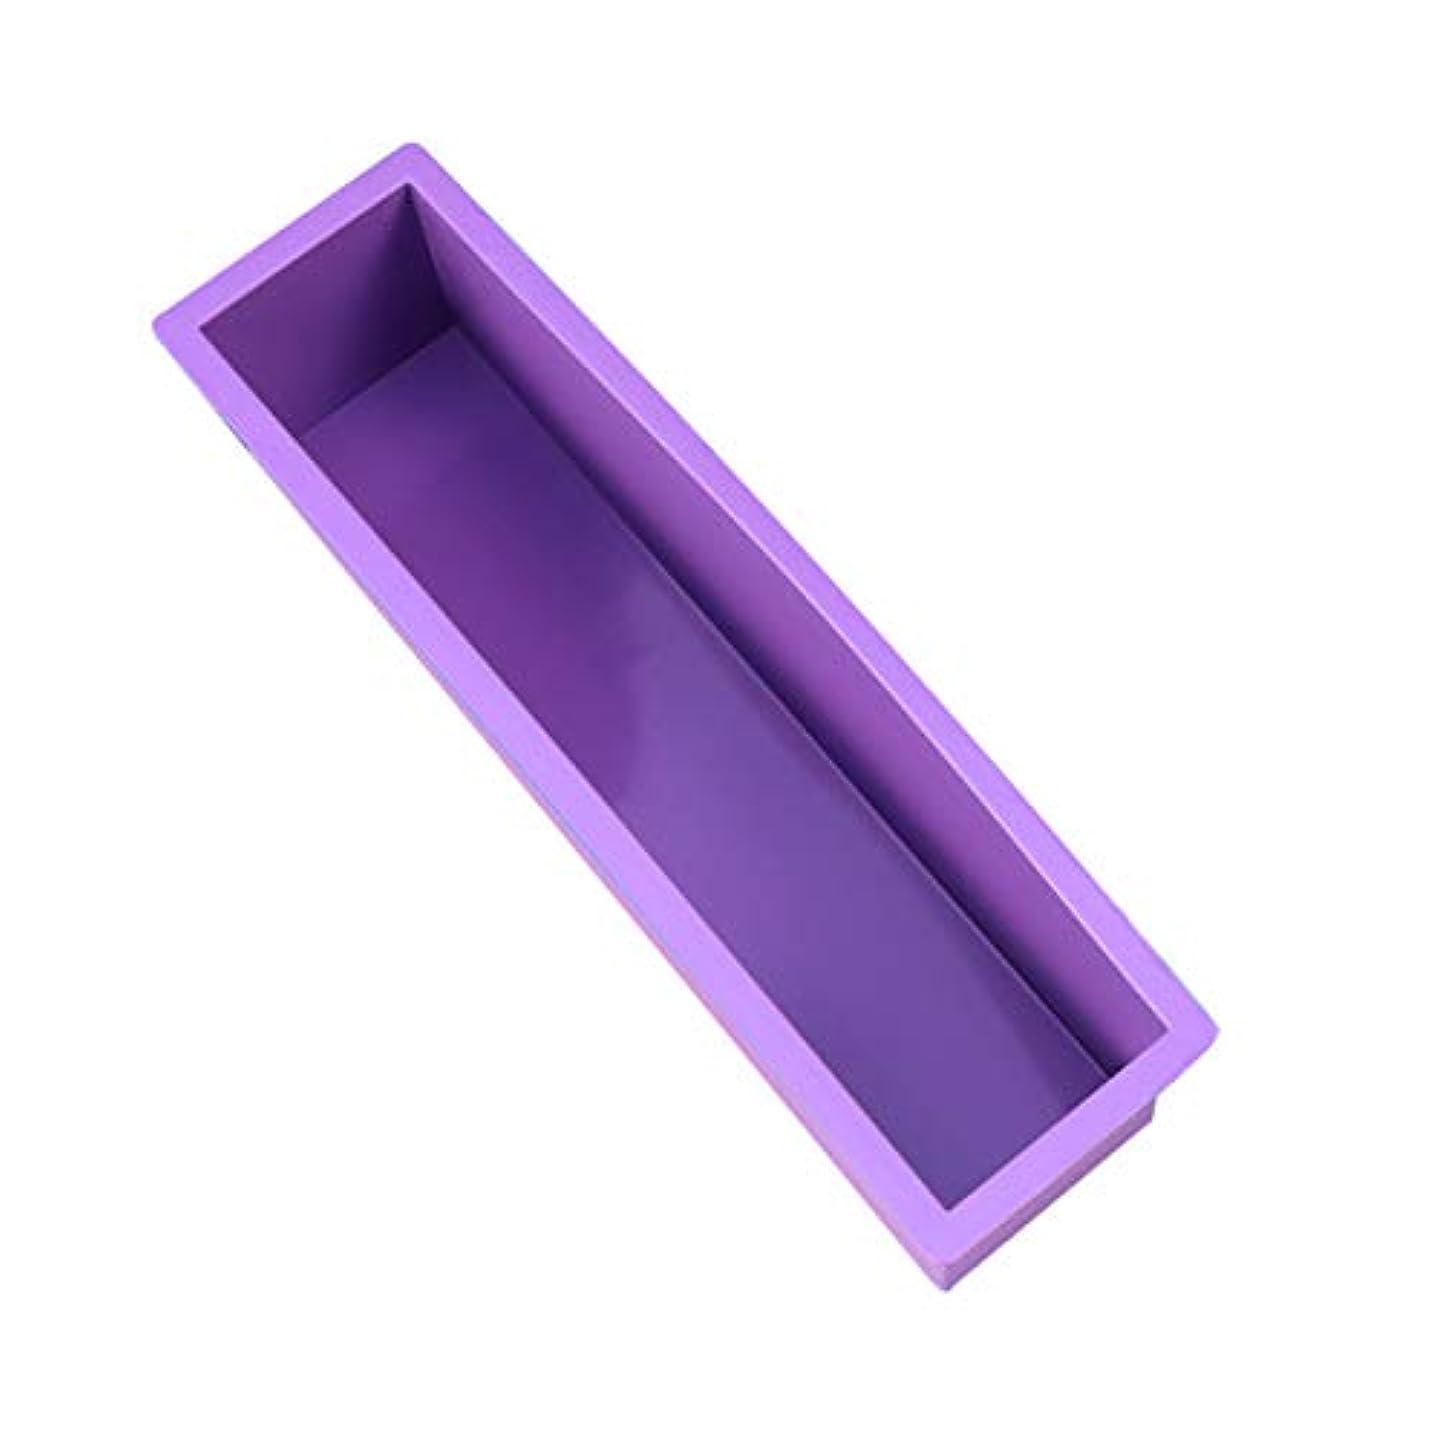 Healifty DIYの石鹸金型スクエアラウンドオーバル金型木製ボックスサイズなしの手作り金型 - S(紫)